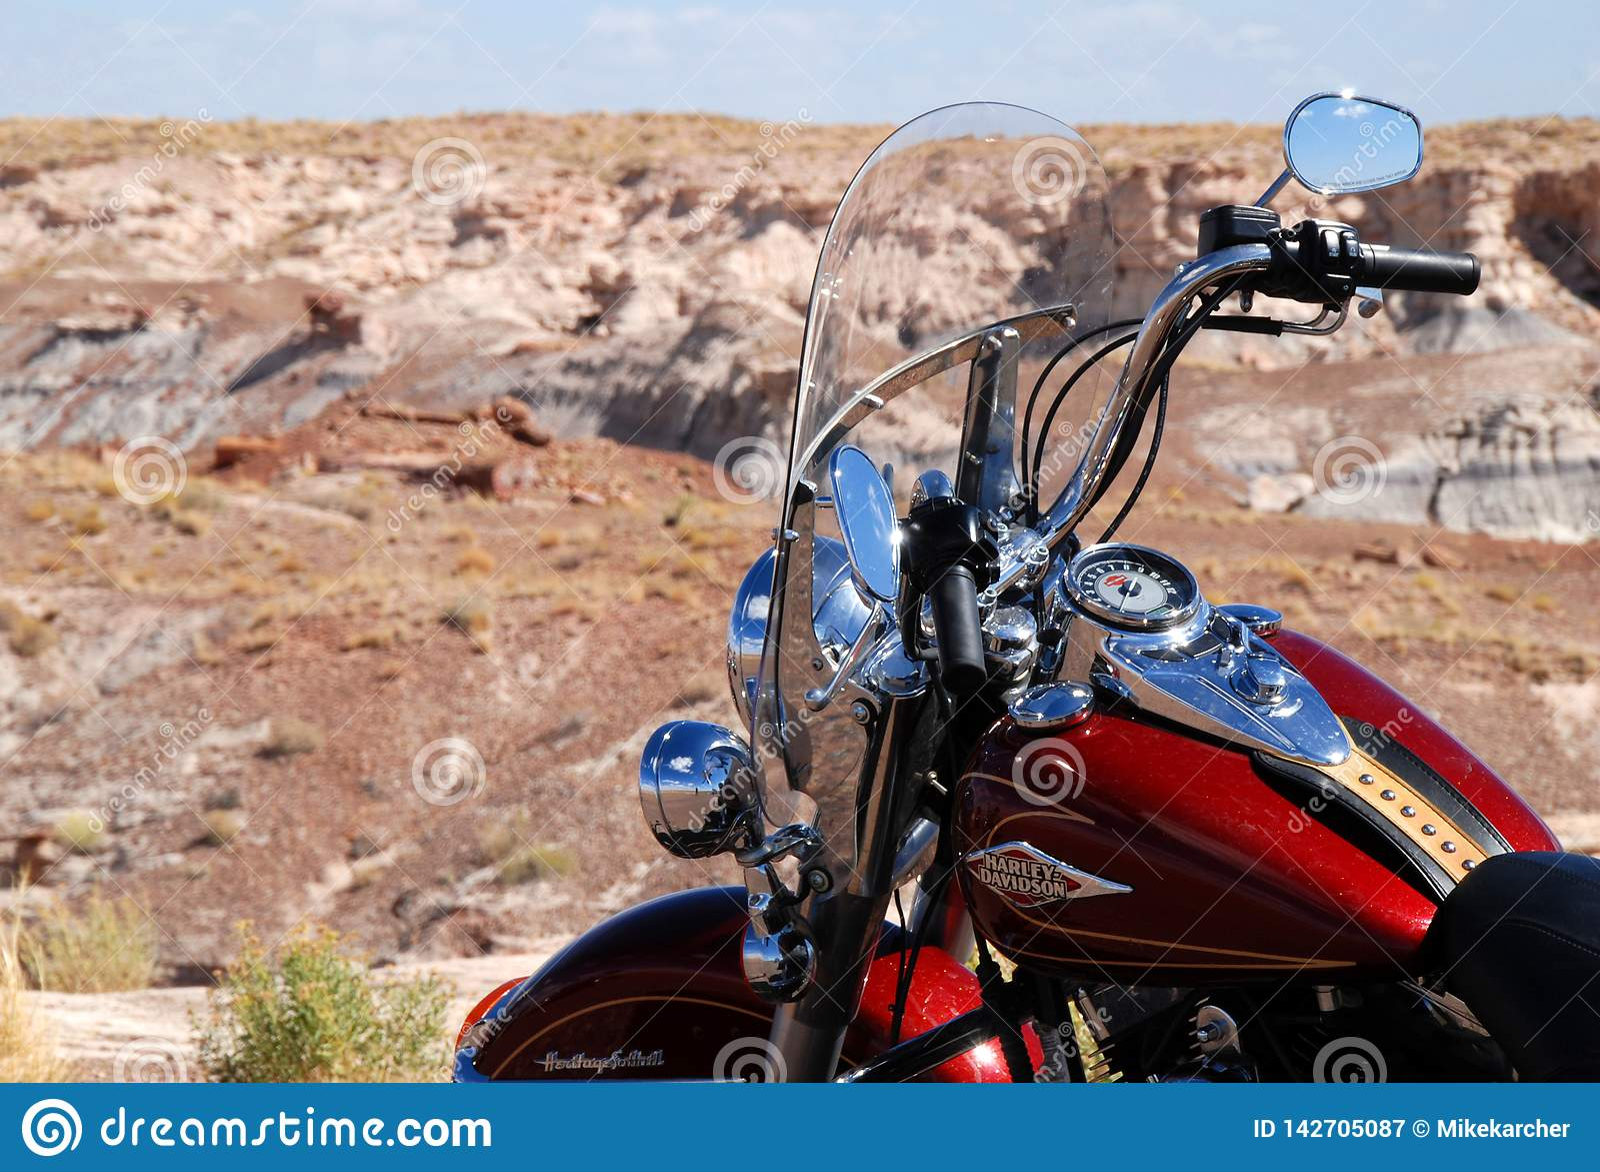 Harley Davidson Arizona >> Harley Davidson In The Desert Editorial Photography Image